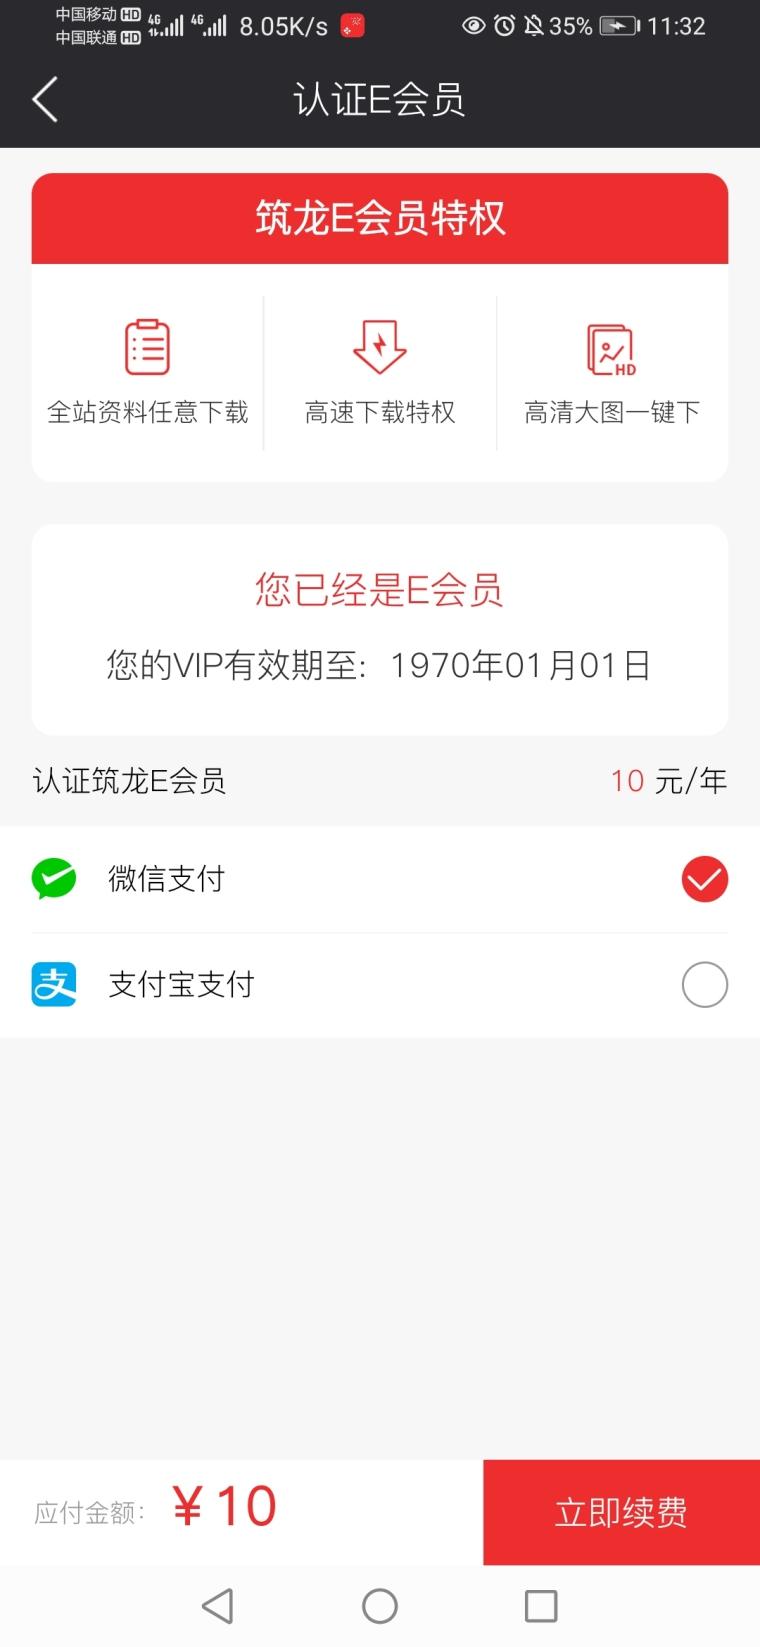 #筑龙教育意见反馈#版本2.4.3,HLK-AL00,android:10_1